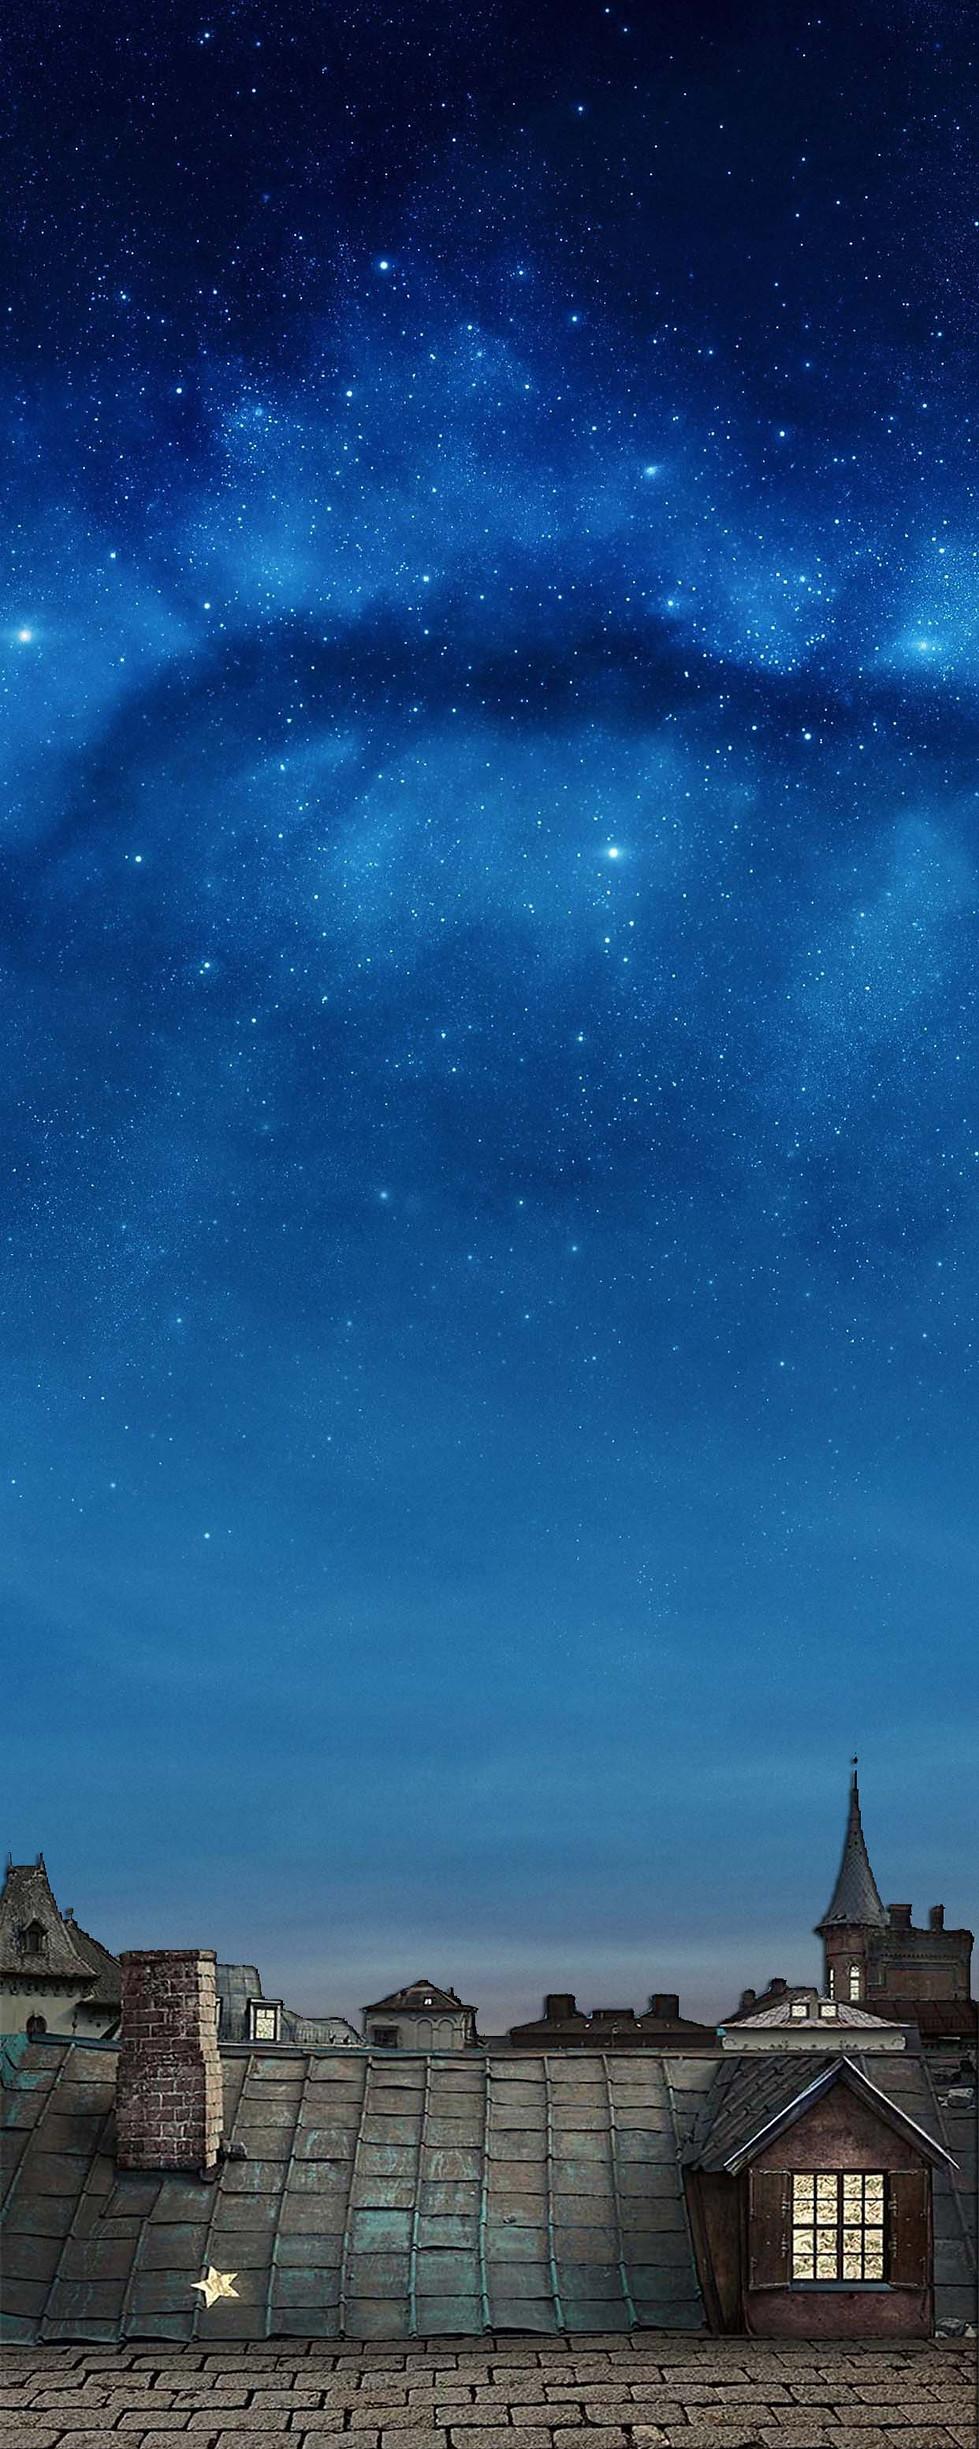 Stars-bky-night_iphone_1242x2688.jpg